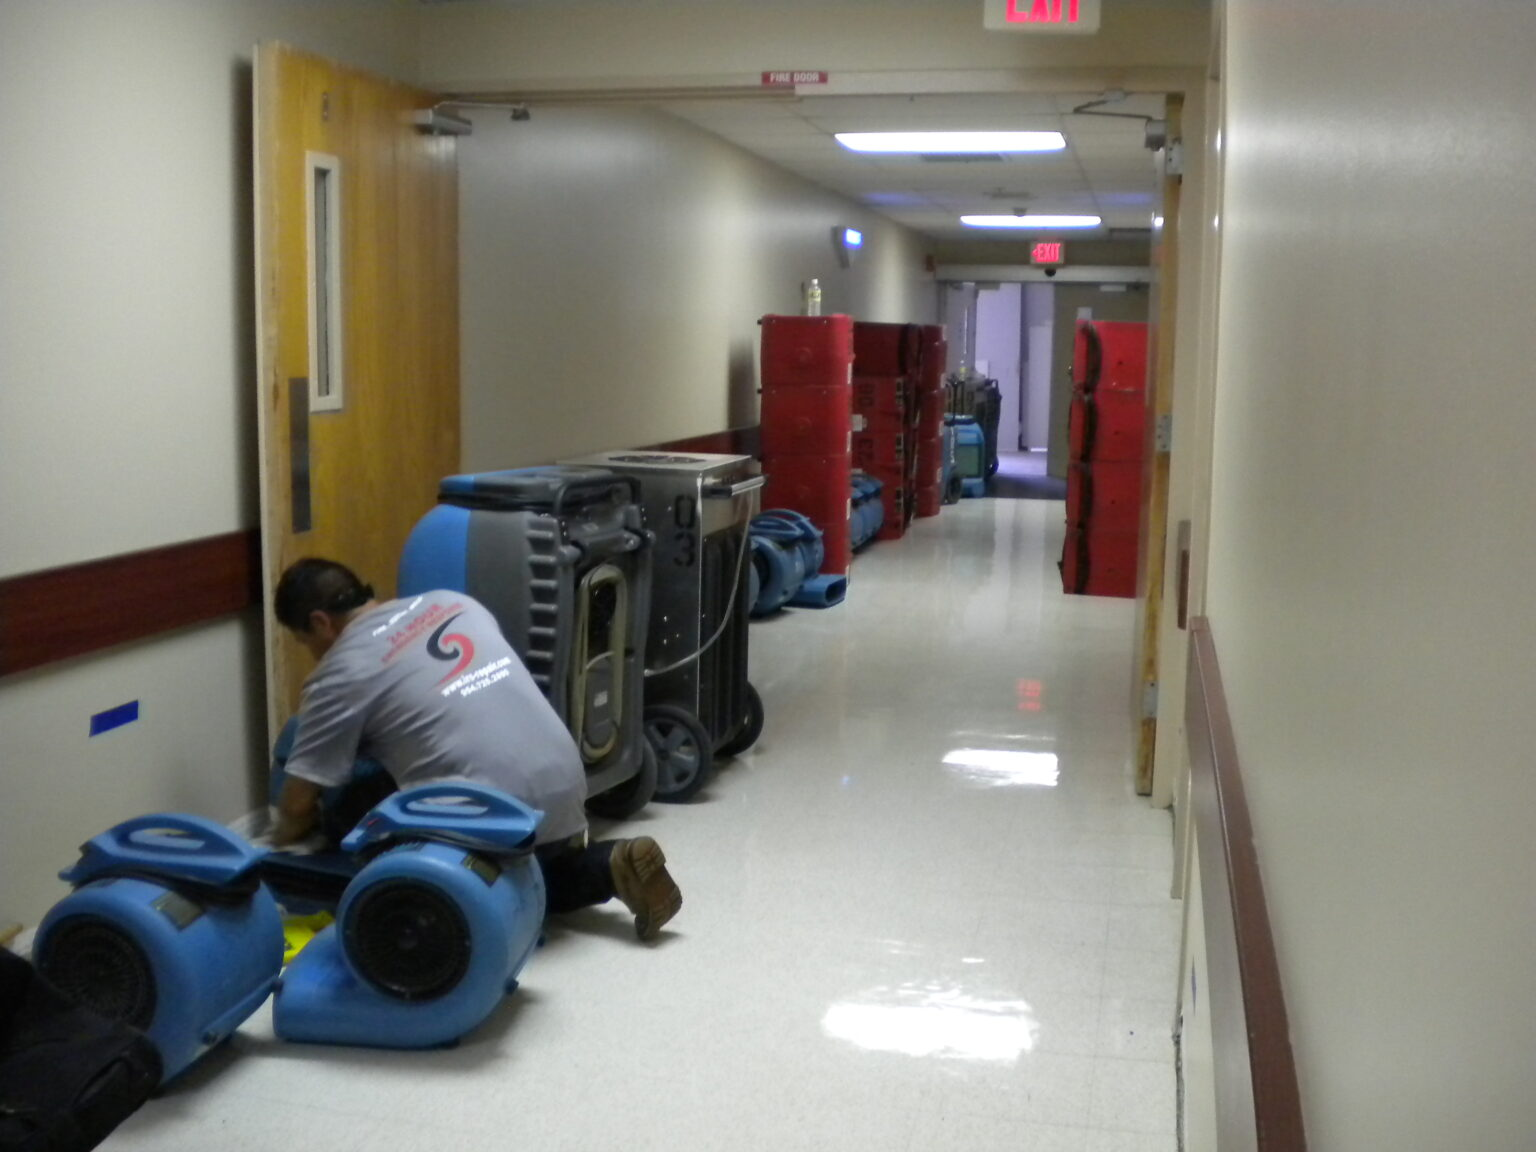 Water damage restoration in a school